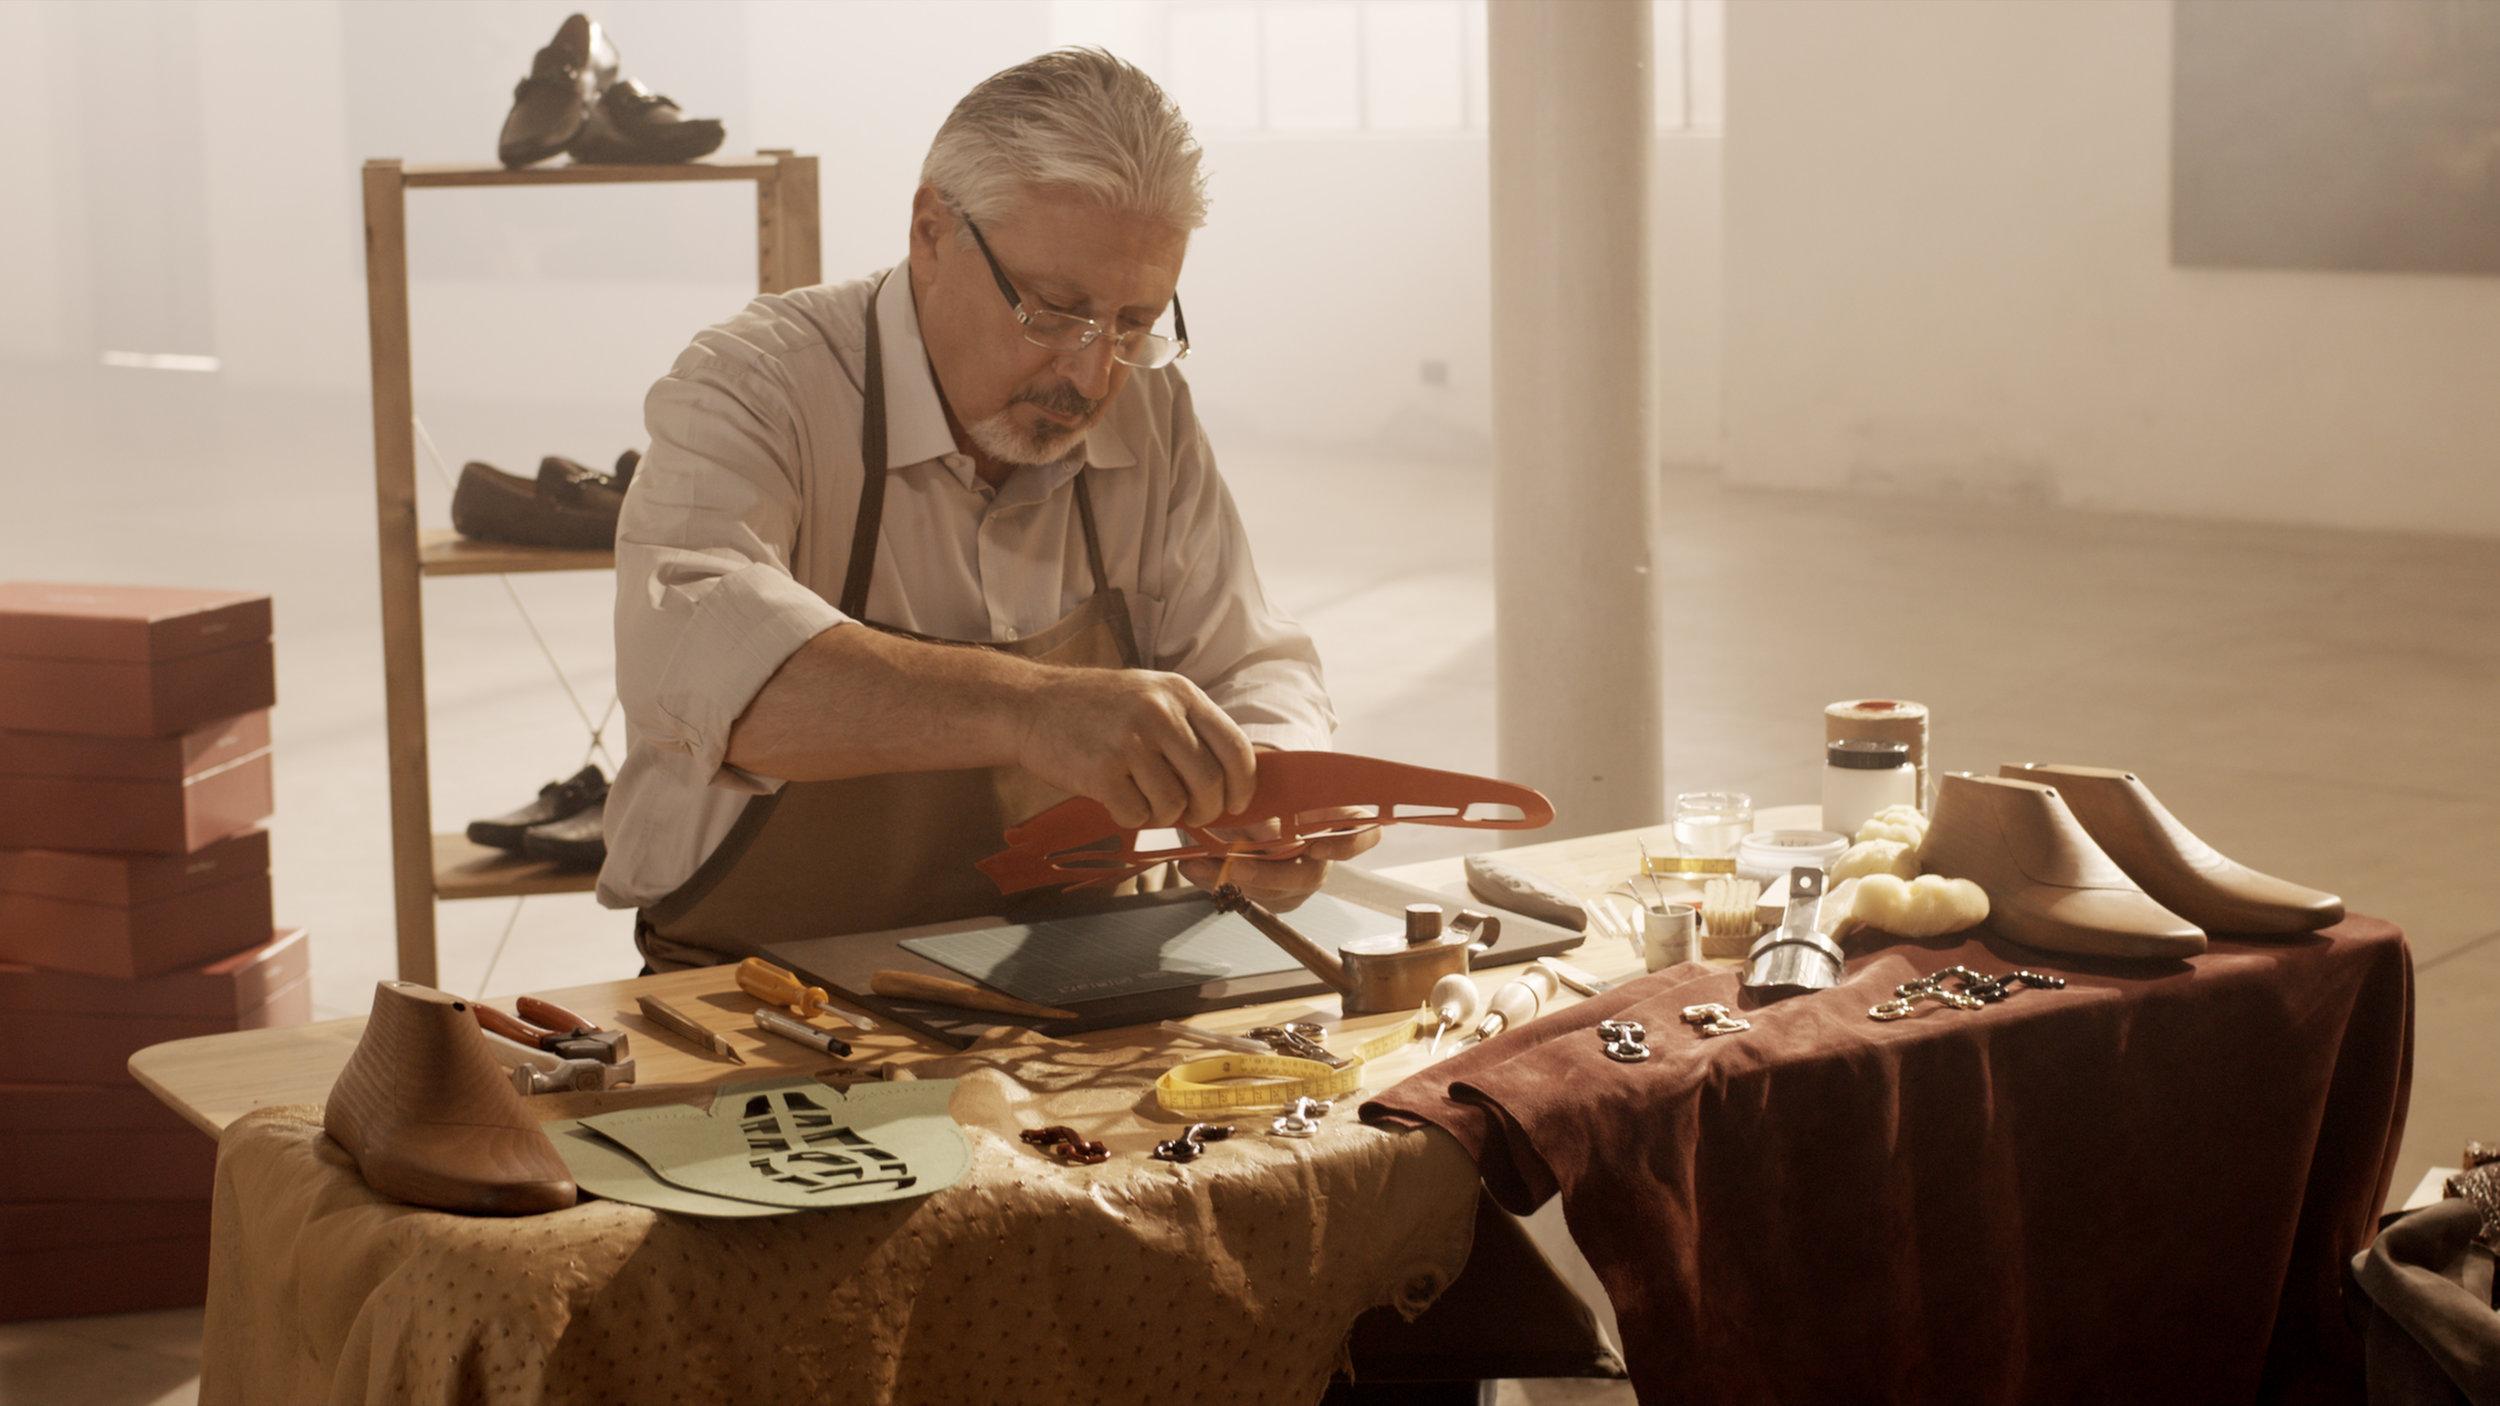 Salvatore Ferragamo Driver Shoes and craftmanship